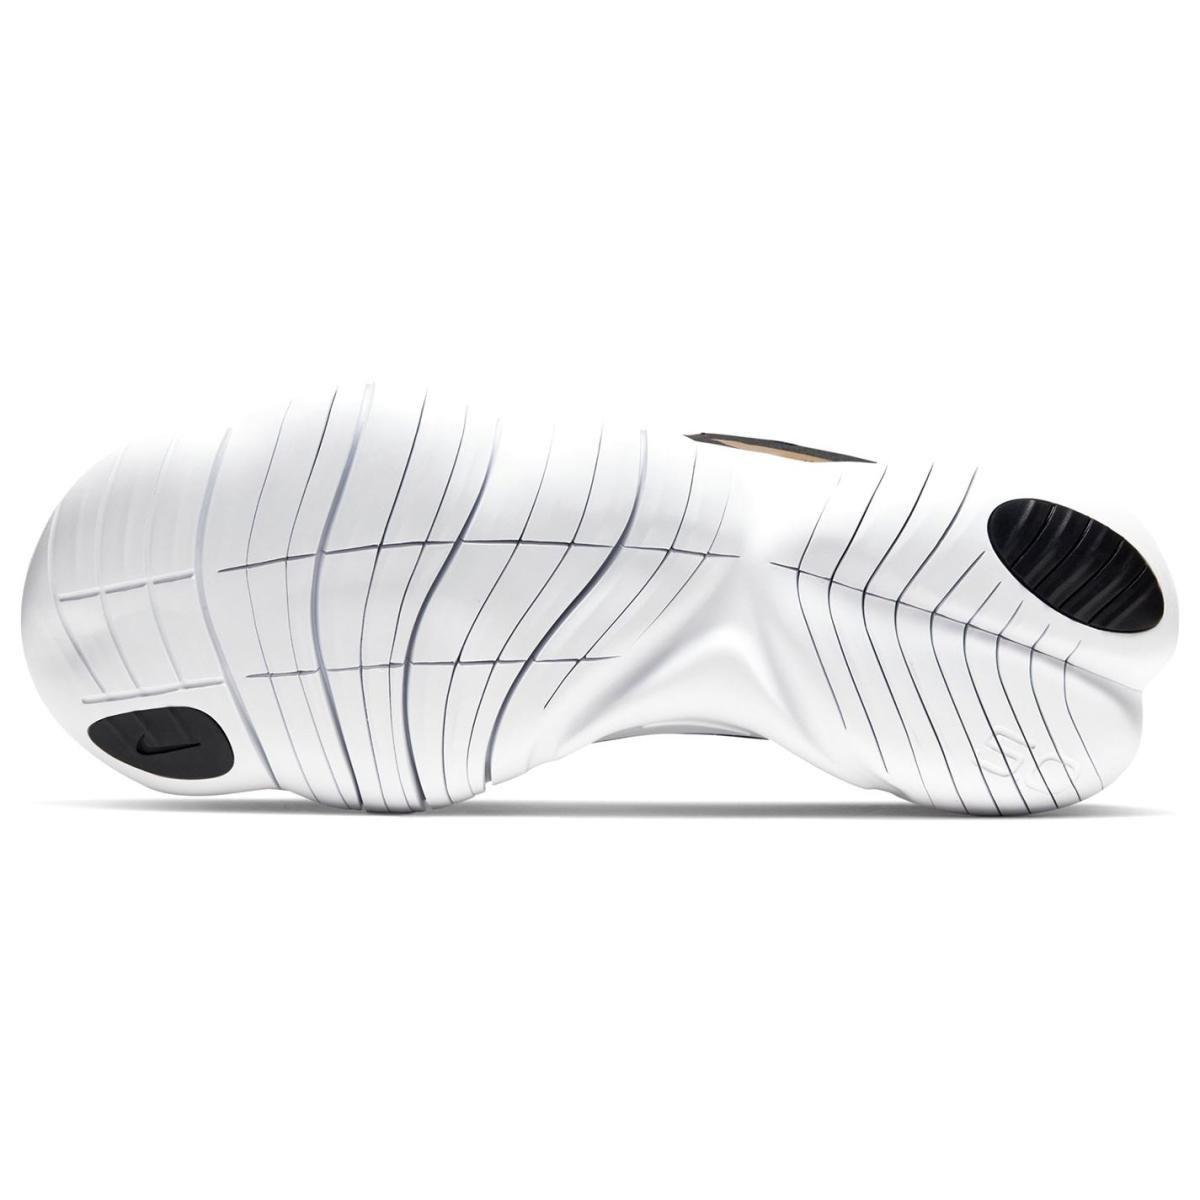 Nike-Free-Run-5-0-Turnschuhe-Damen-Sneaker-Sportschuhe-Laufschuhe-4923 Indexbild 7